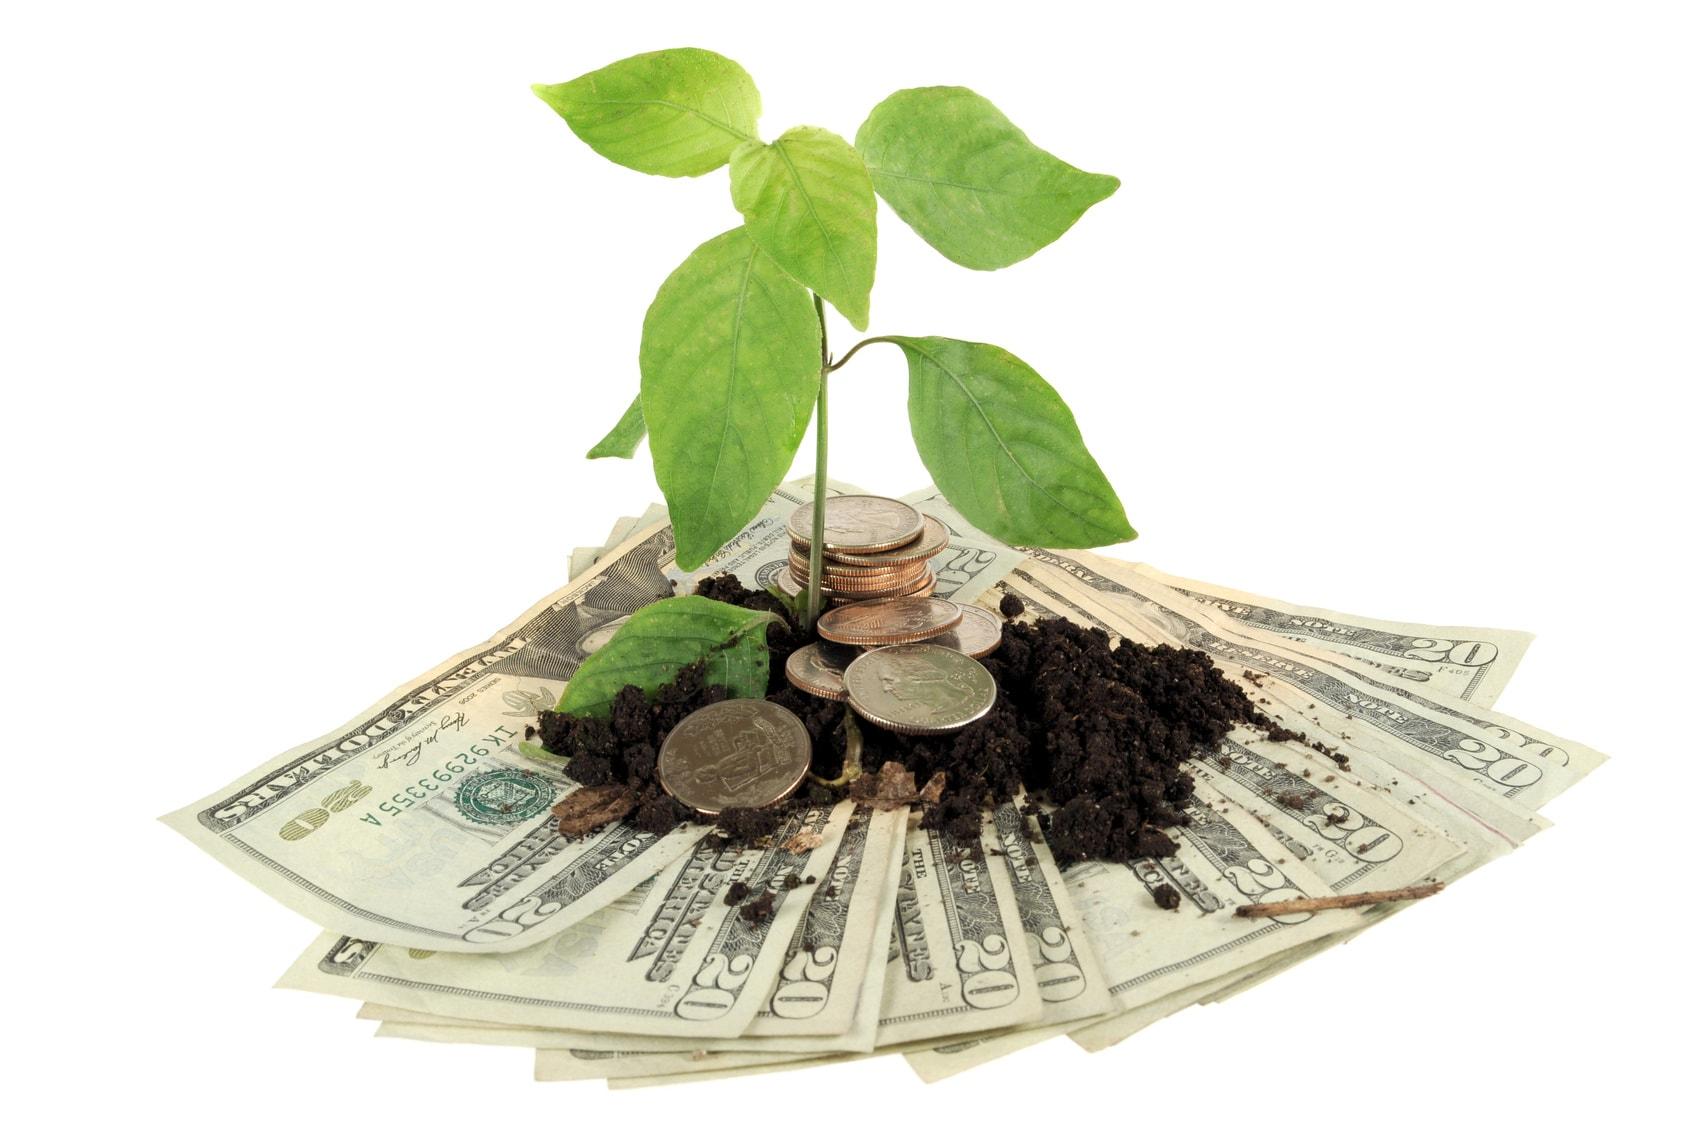 SMALL-BUSINESS-FINANCING1-min